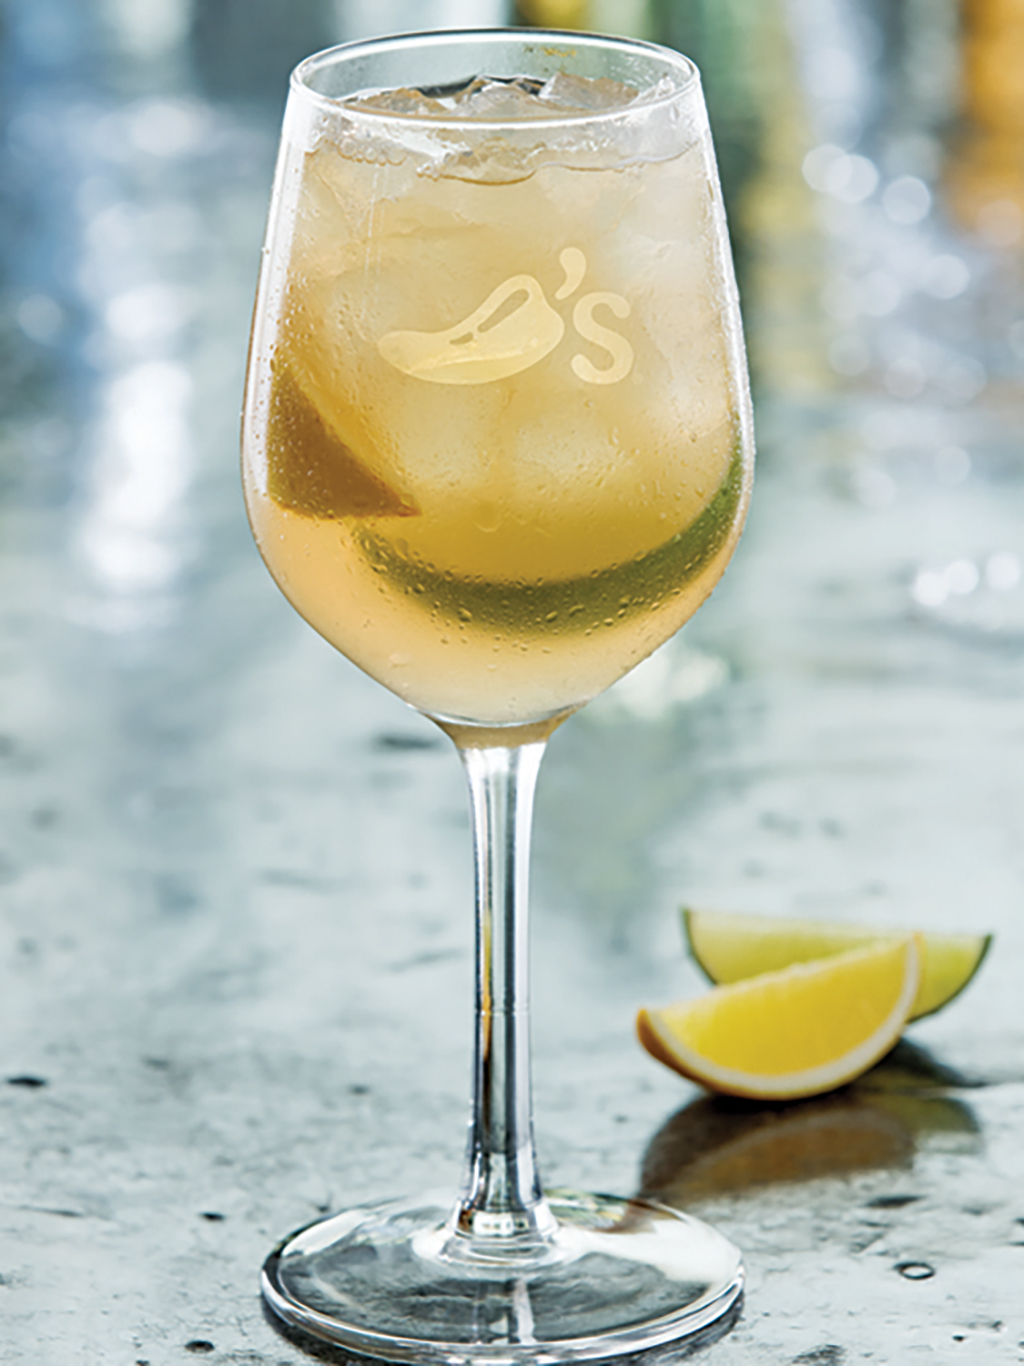 Chili's Tequila White Sangria